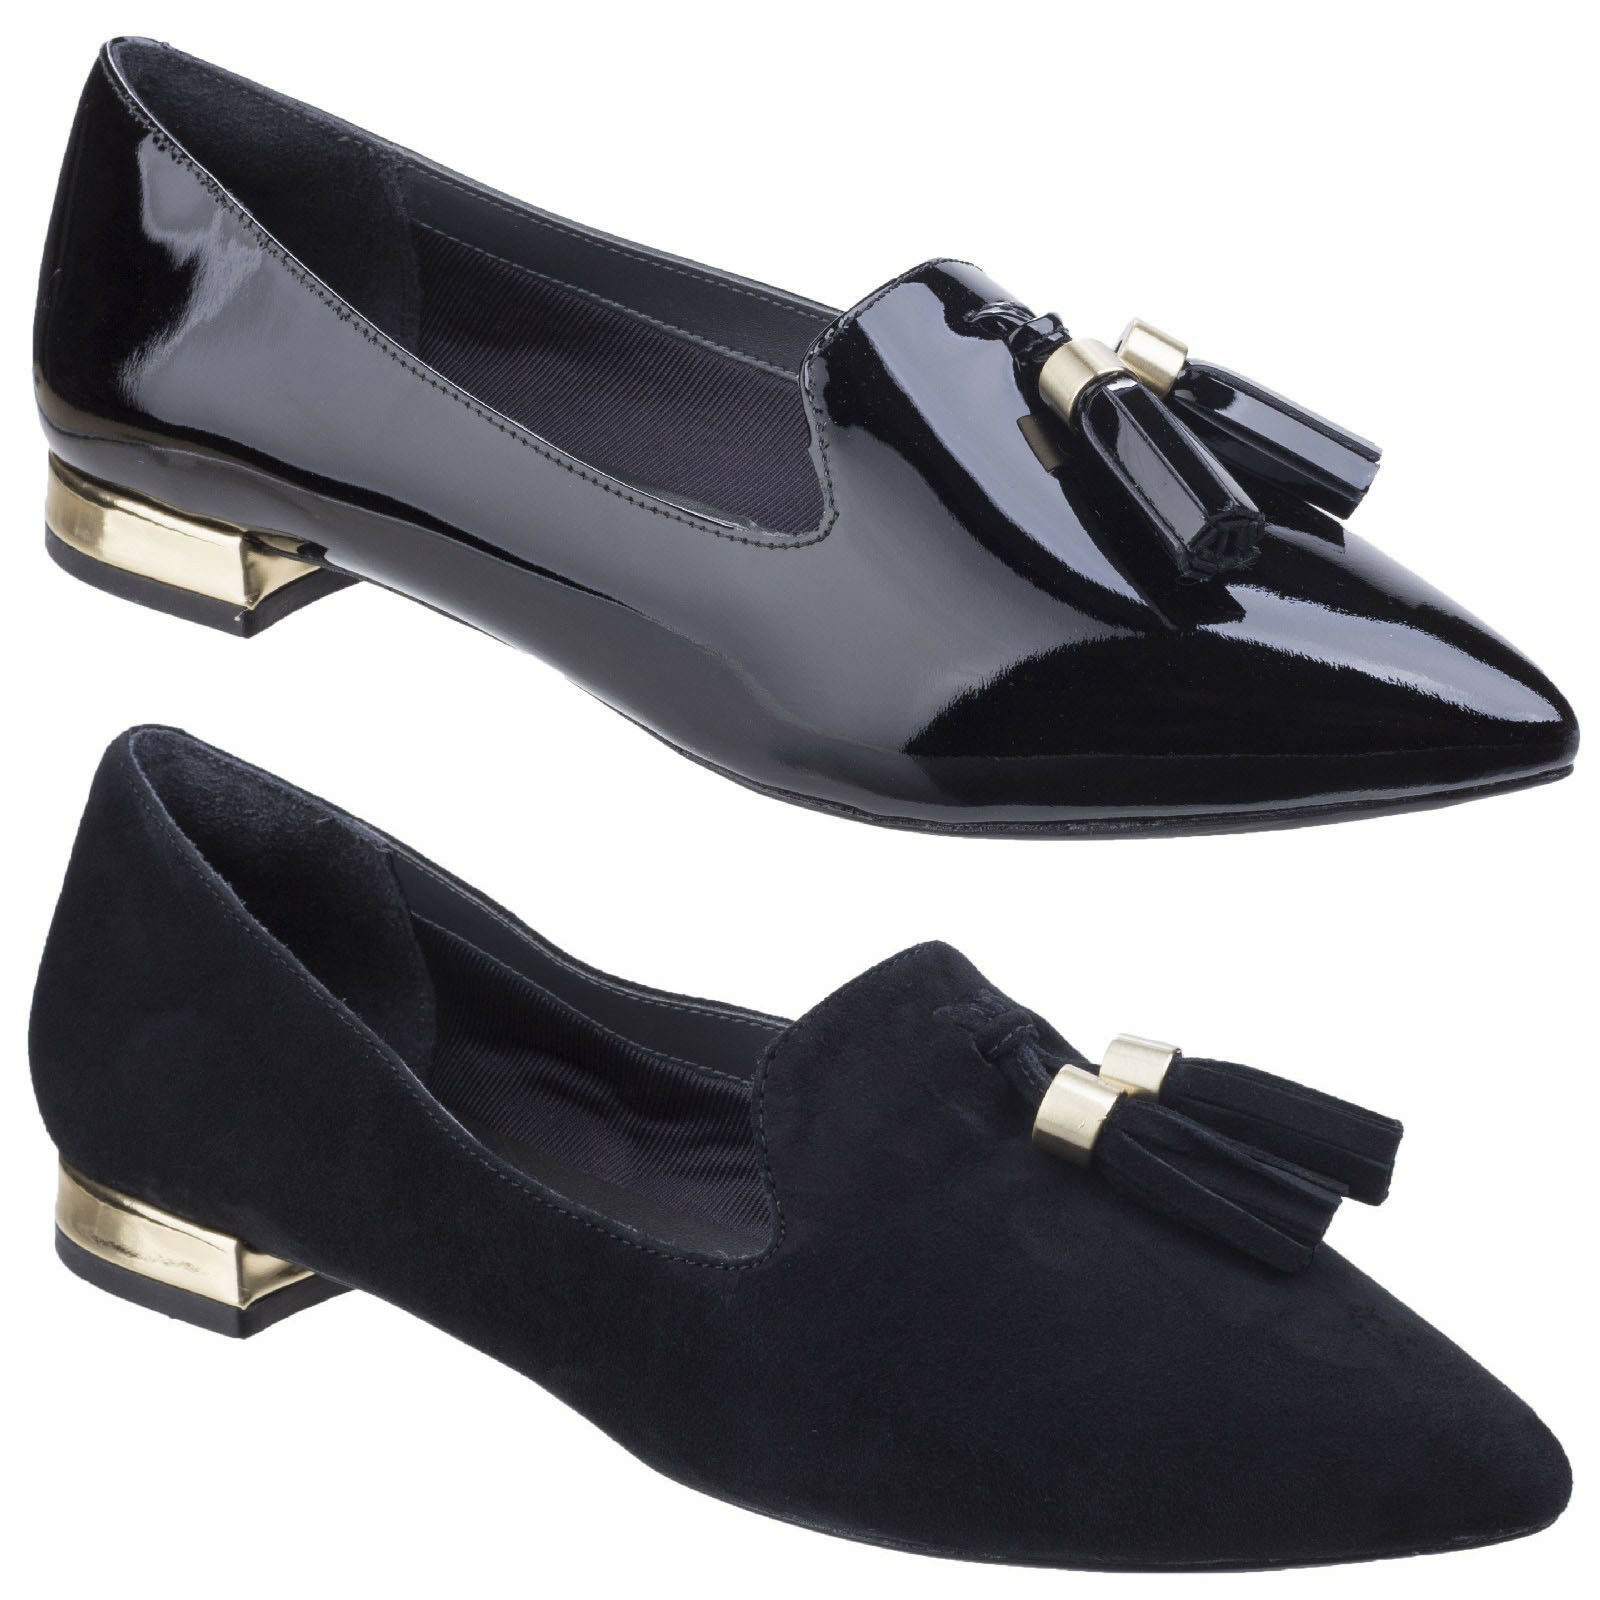 Rockport Total Motion zuly Mocassins femmes cuir décontracté chaussures plates